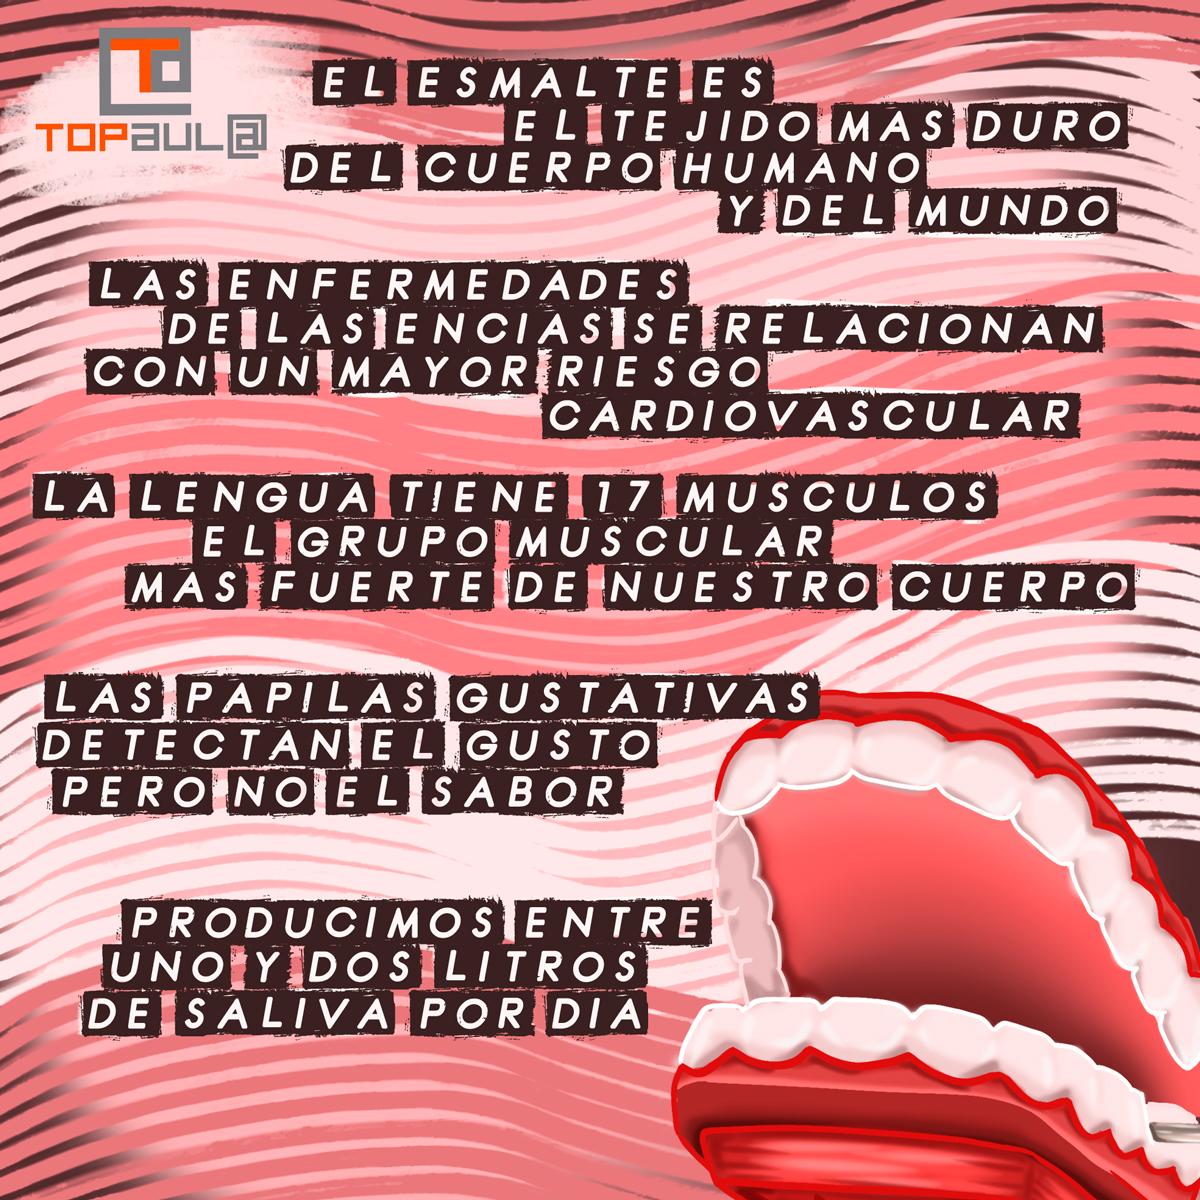 Infografía Curiosidades sobre nuestra boca - www.topaula.com